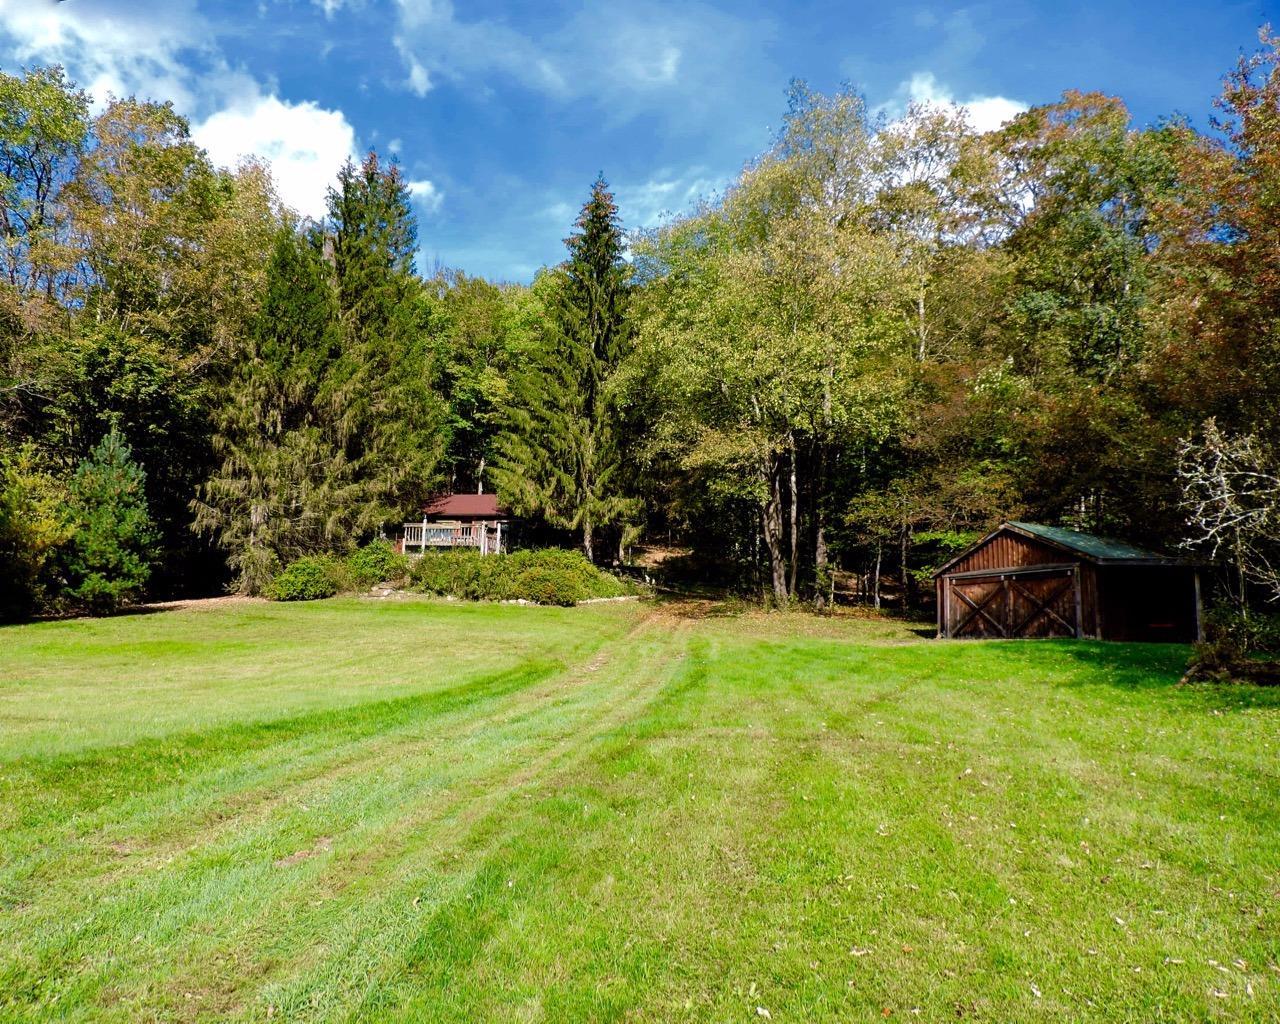 Slide Mountain Catskills vintage cabin